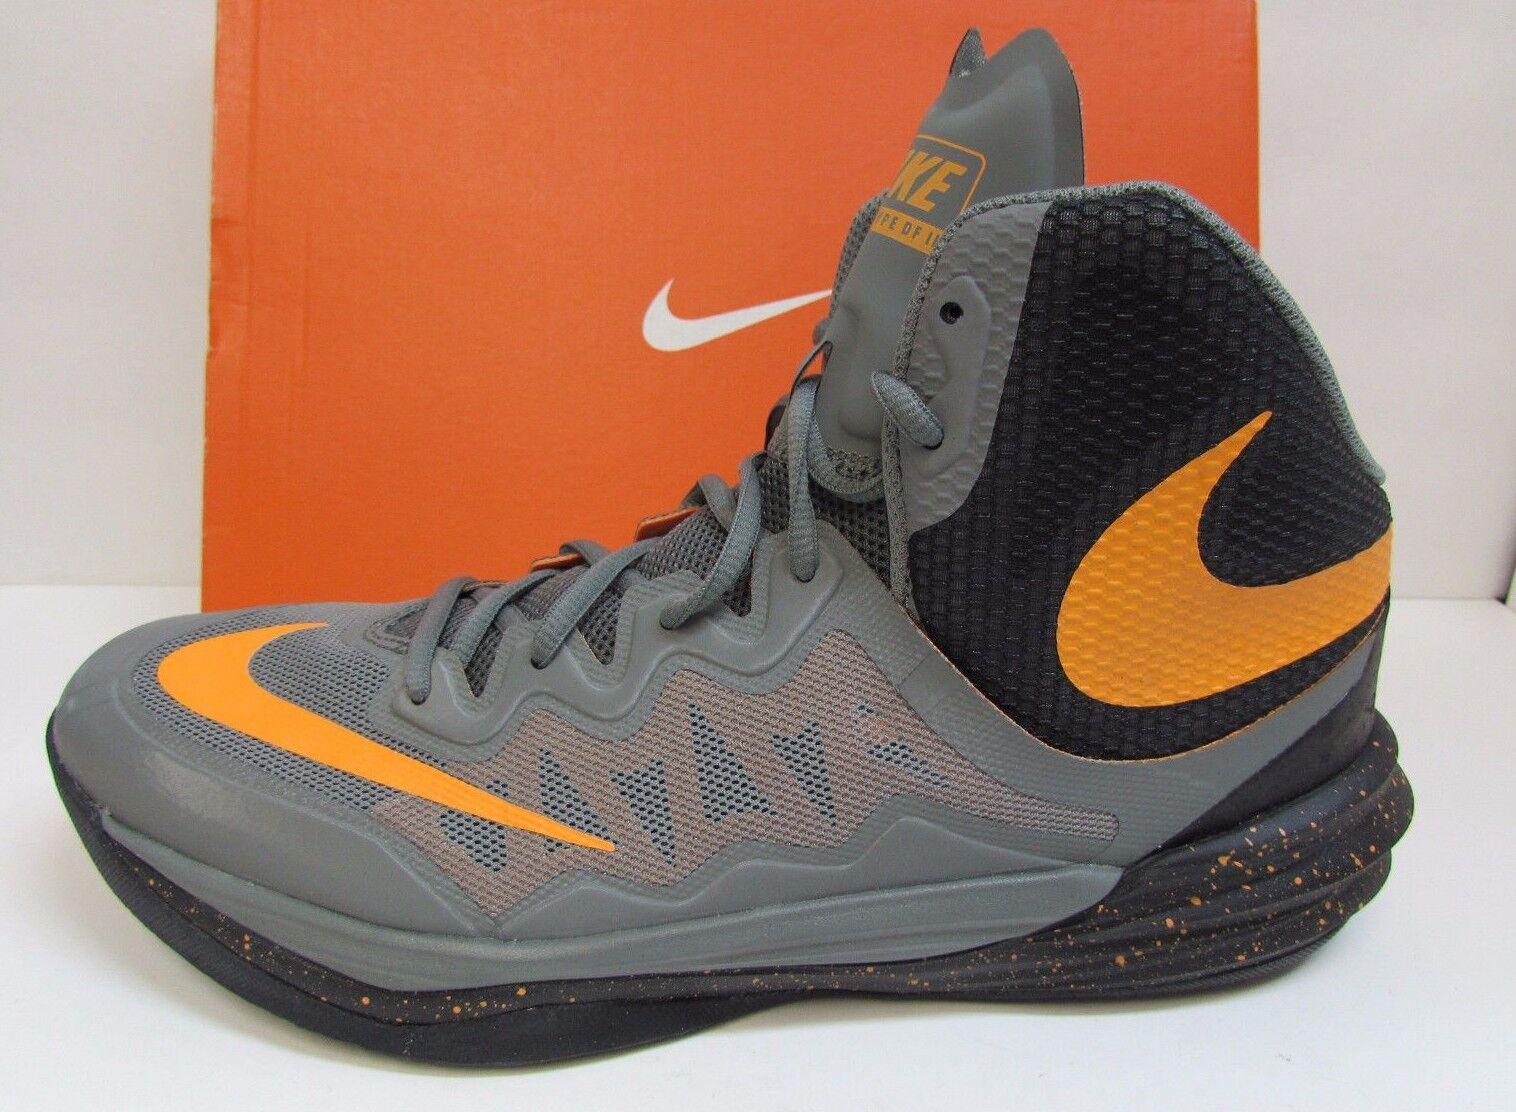 Nike Size 11 Grey Hi Top Sneakers New Mens shoes